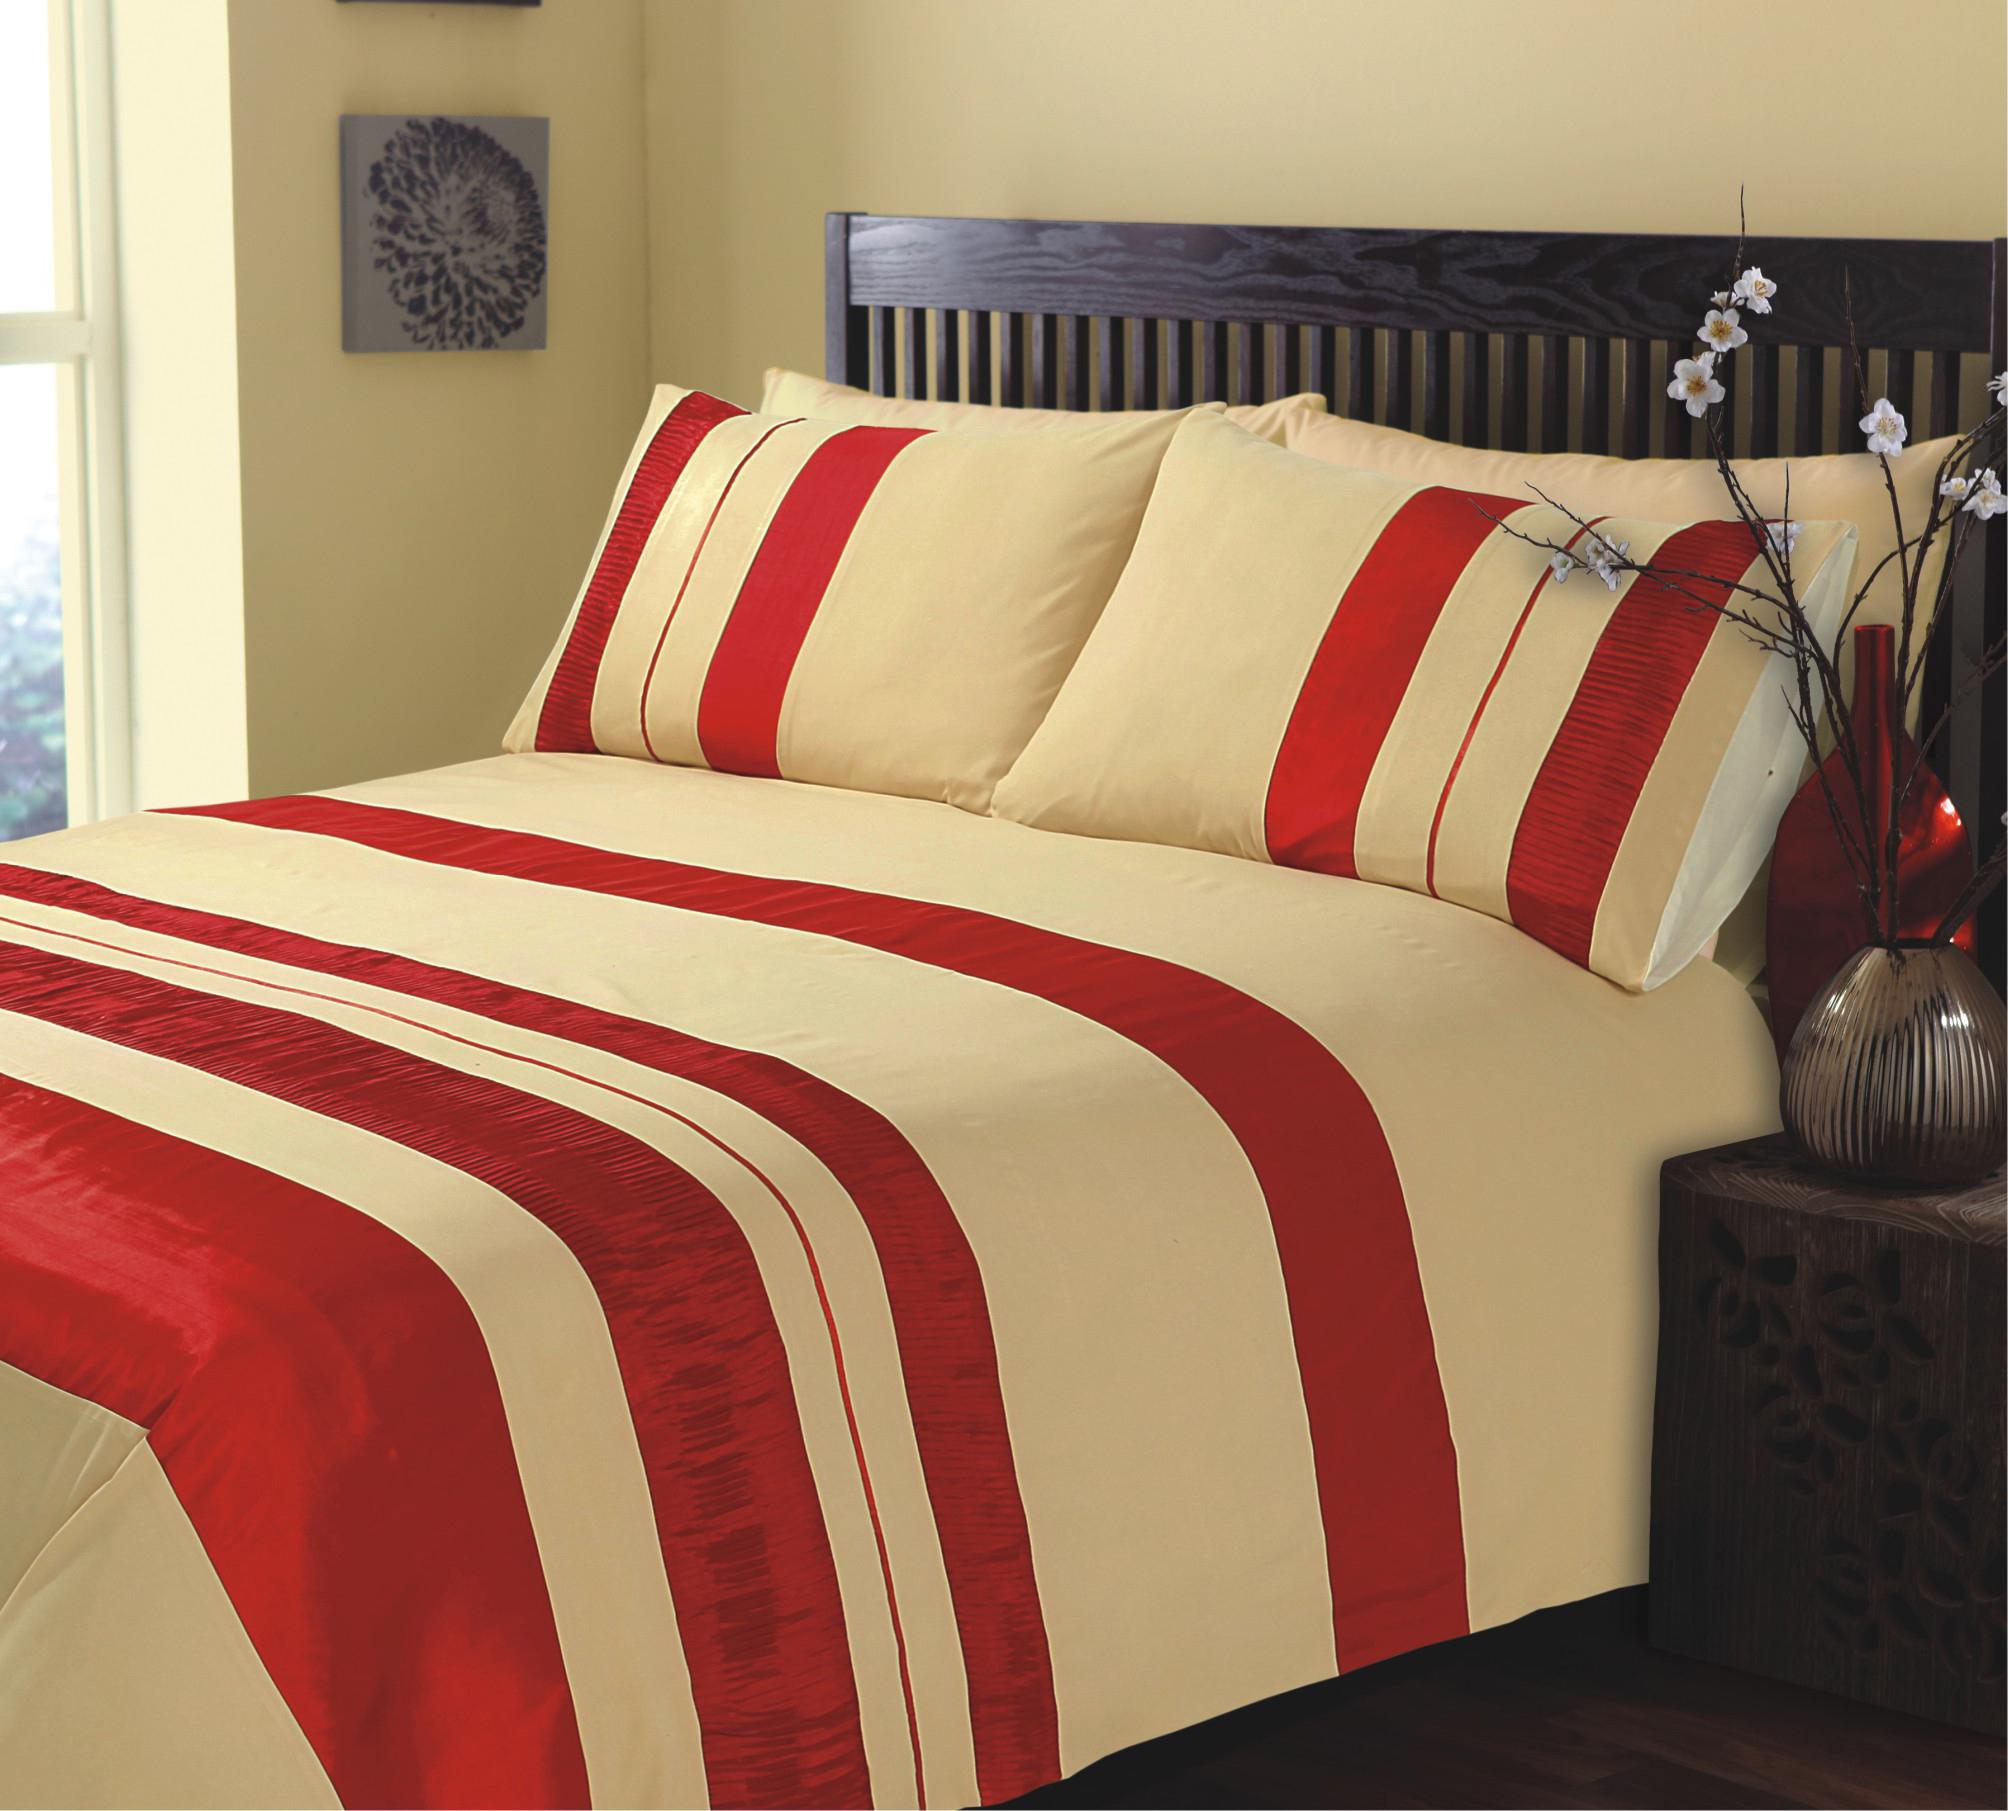 Red Stripe Bedding Sets Bedding Designs